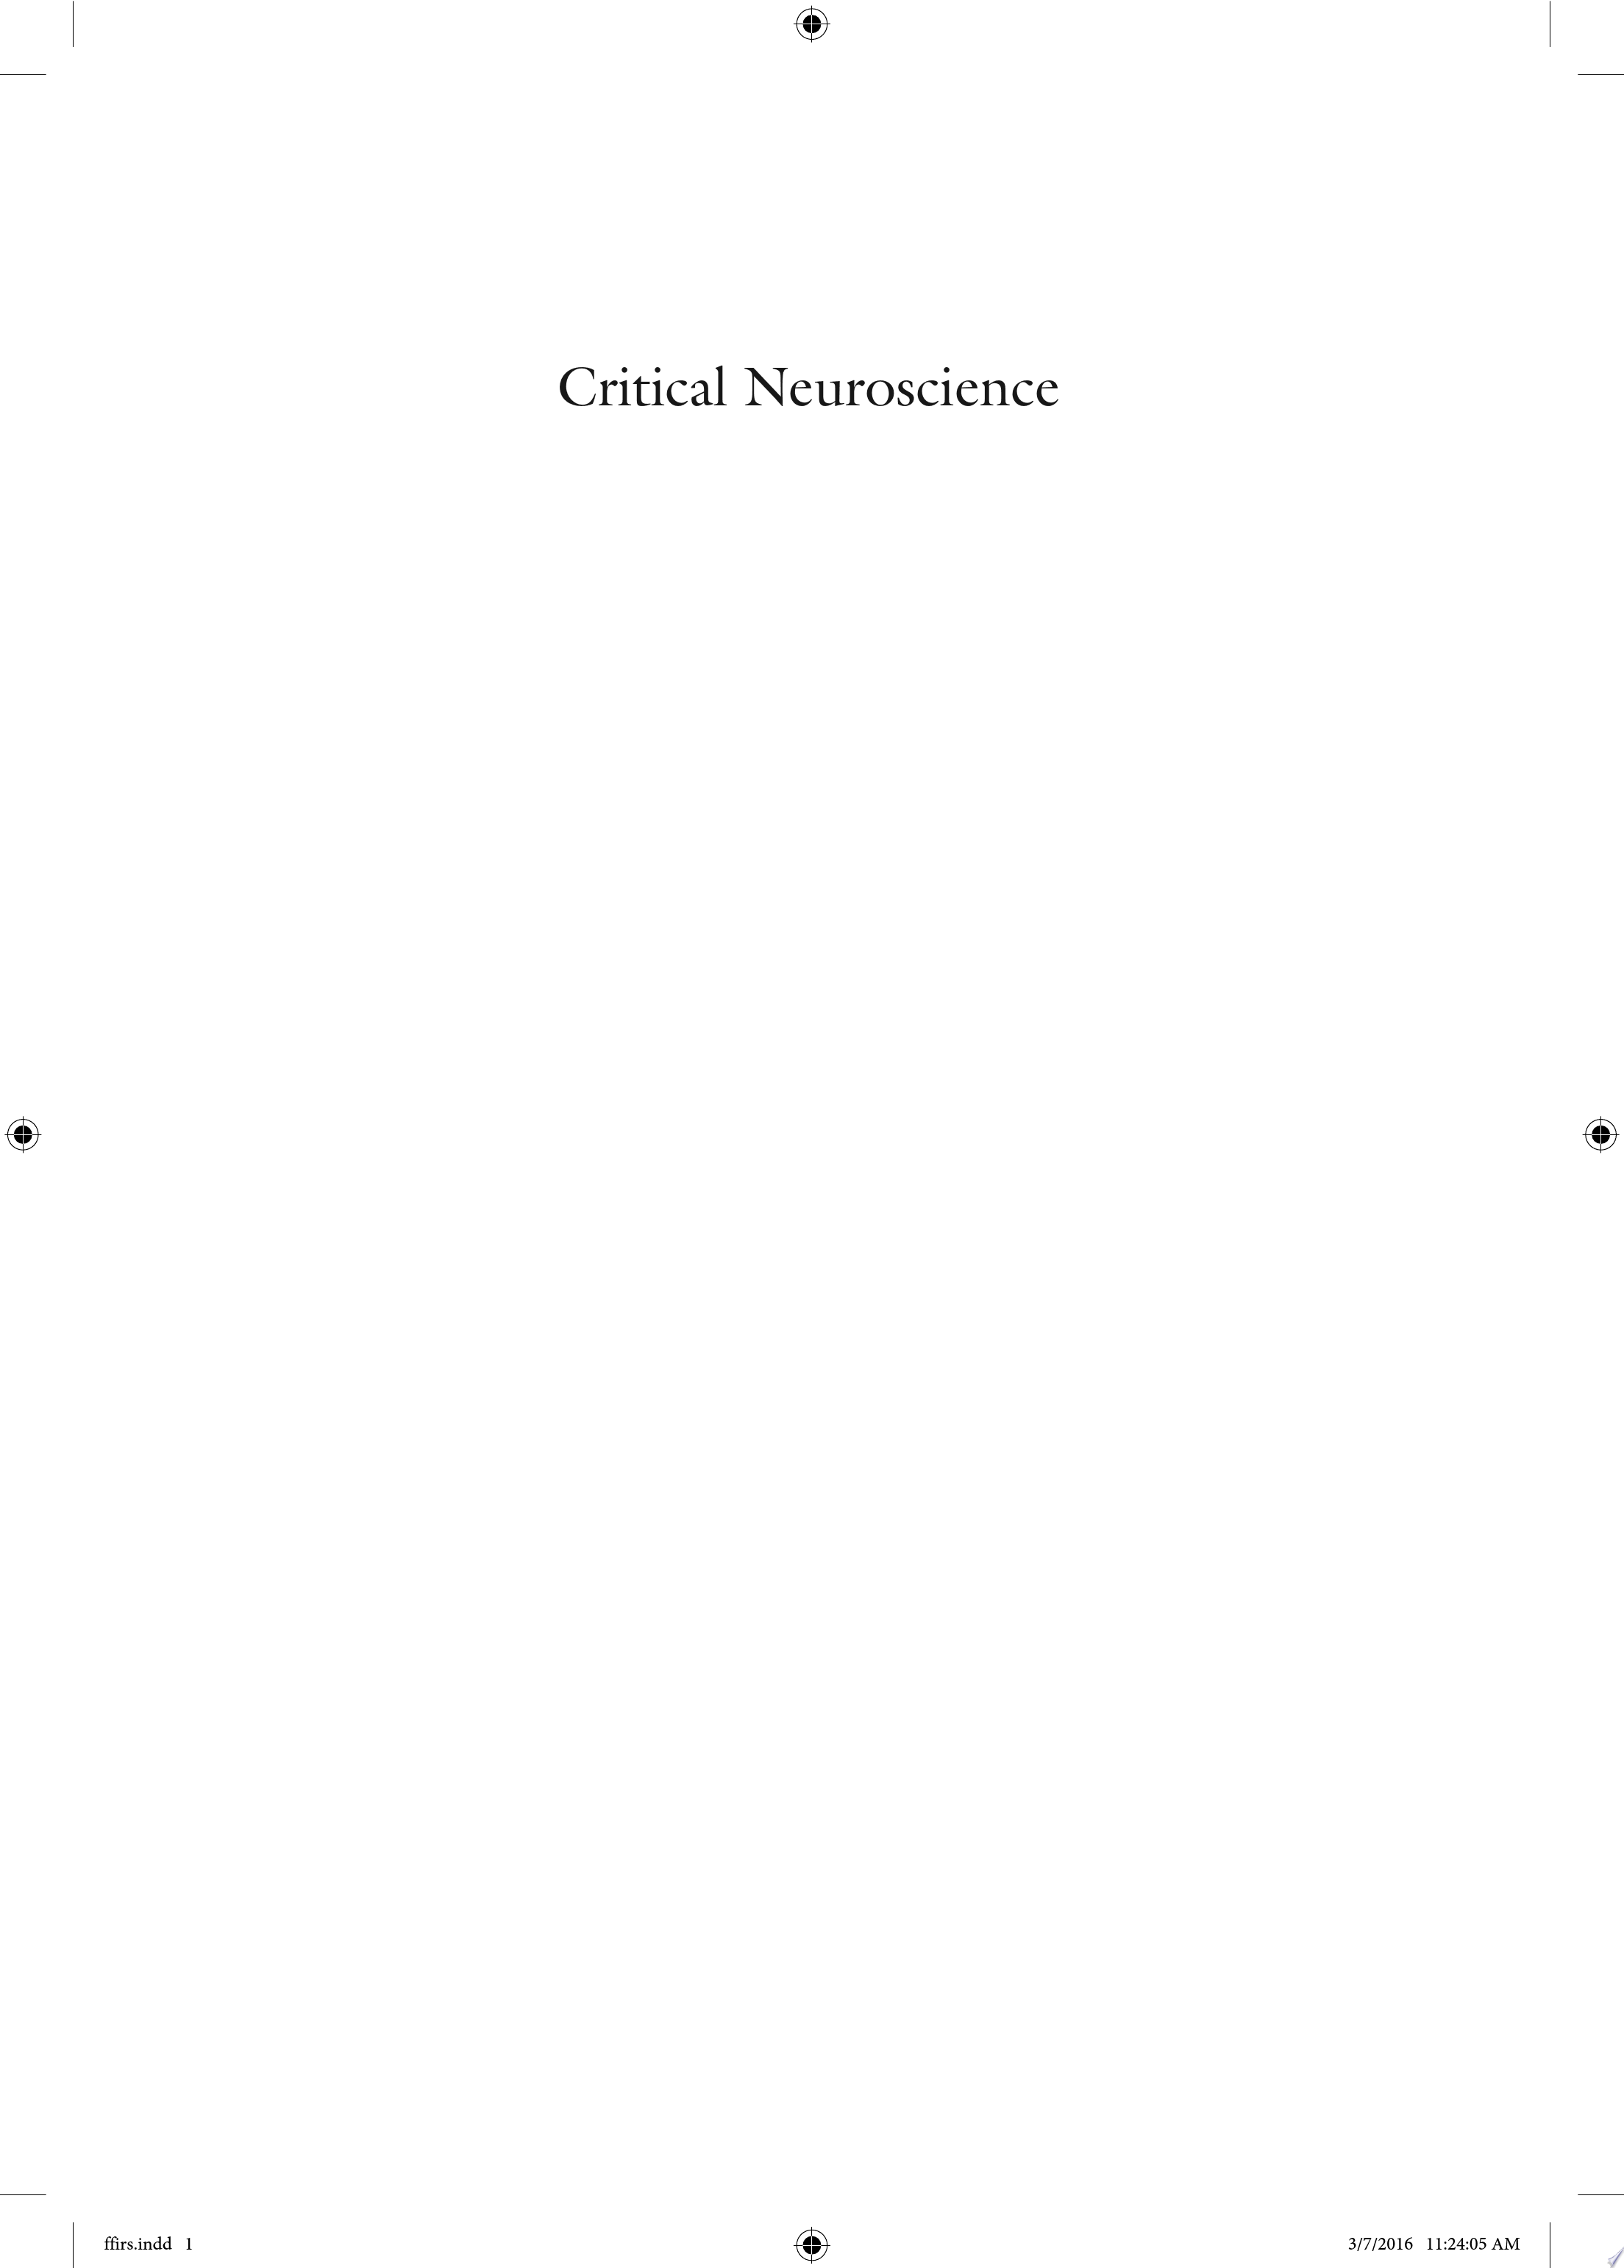 Critical Neuroscience